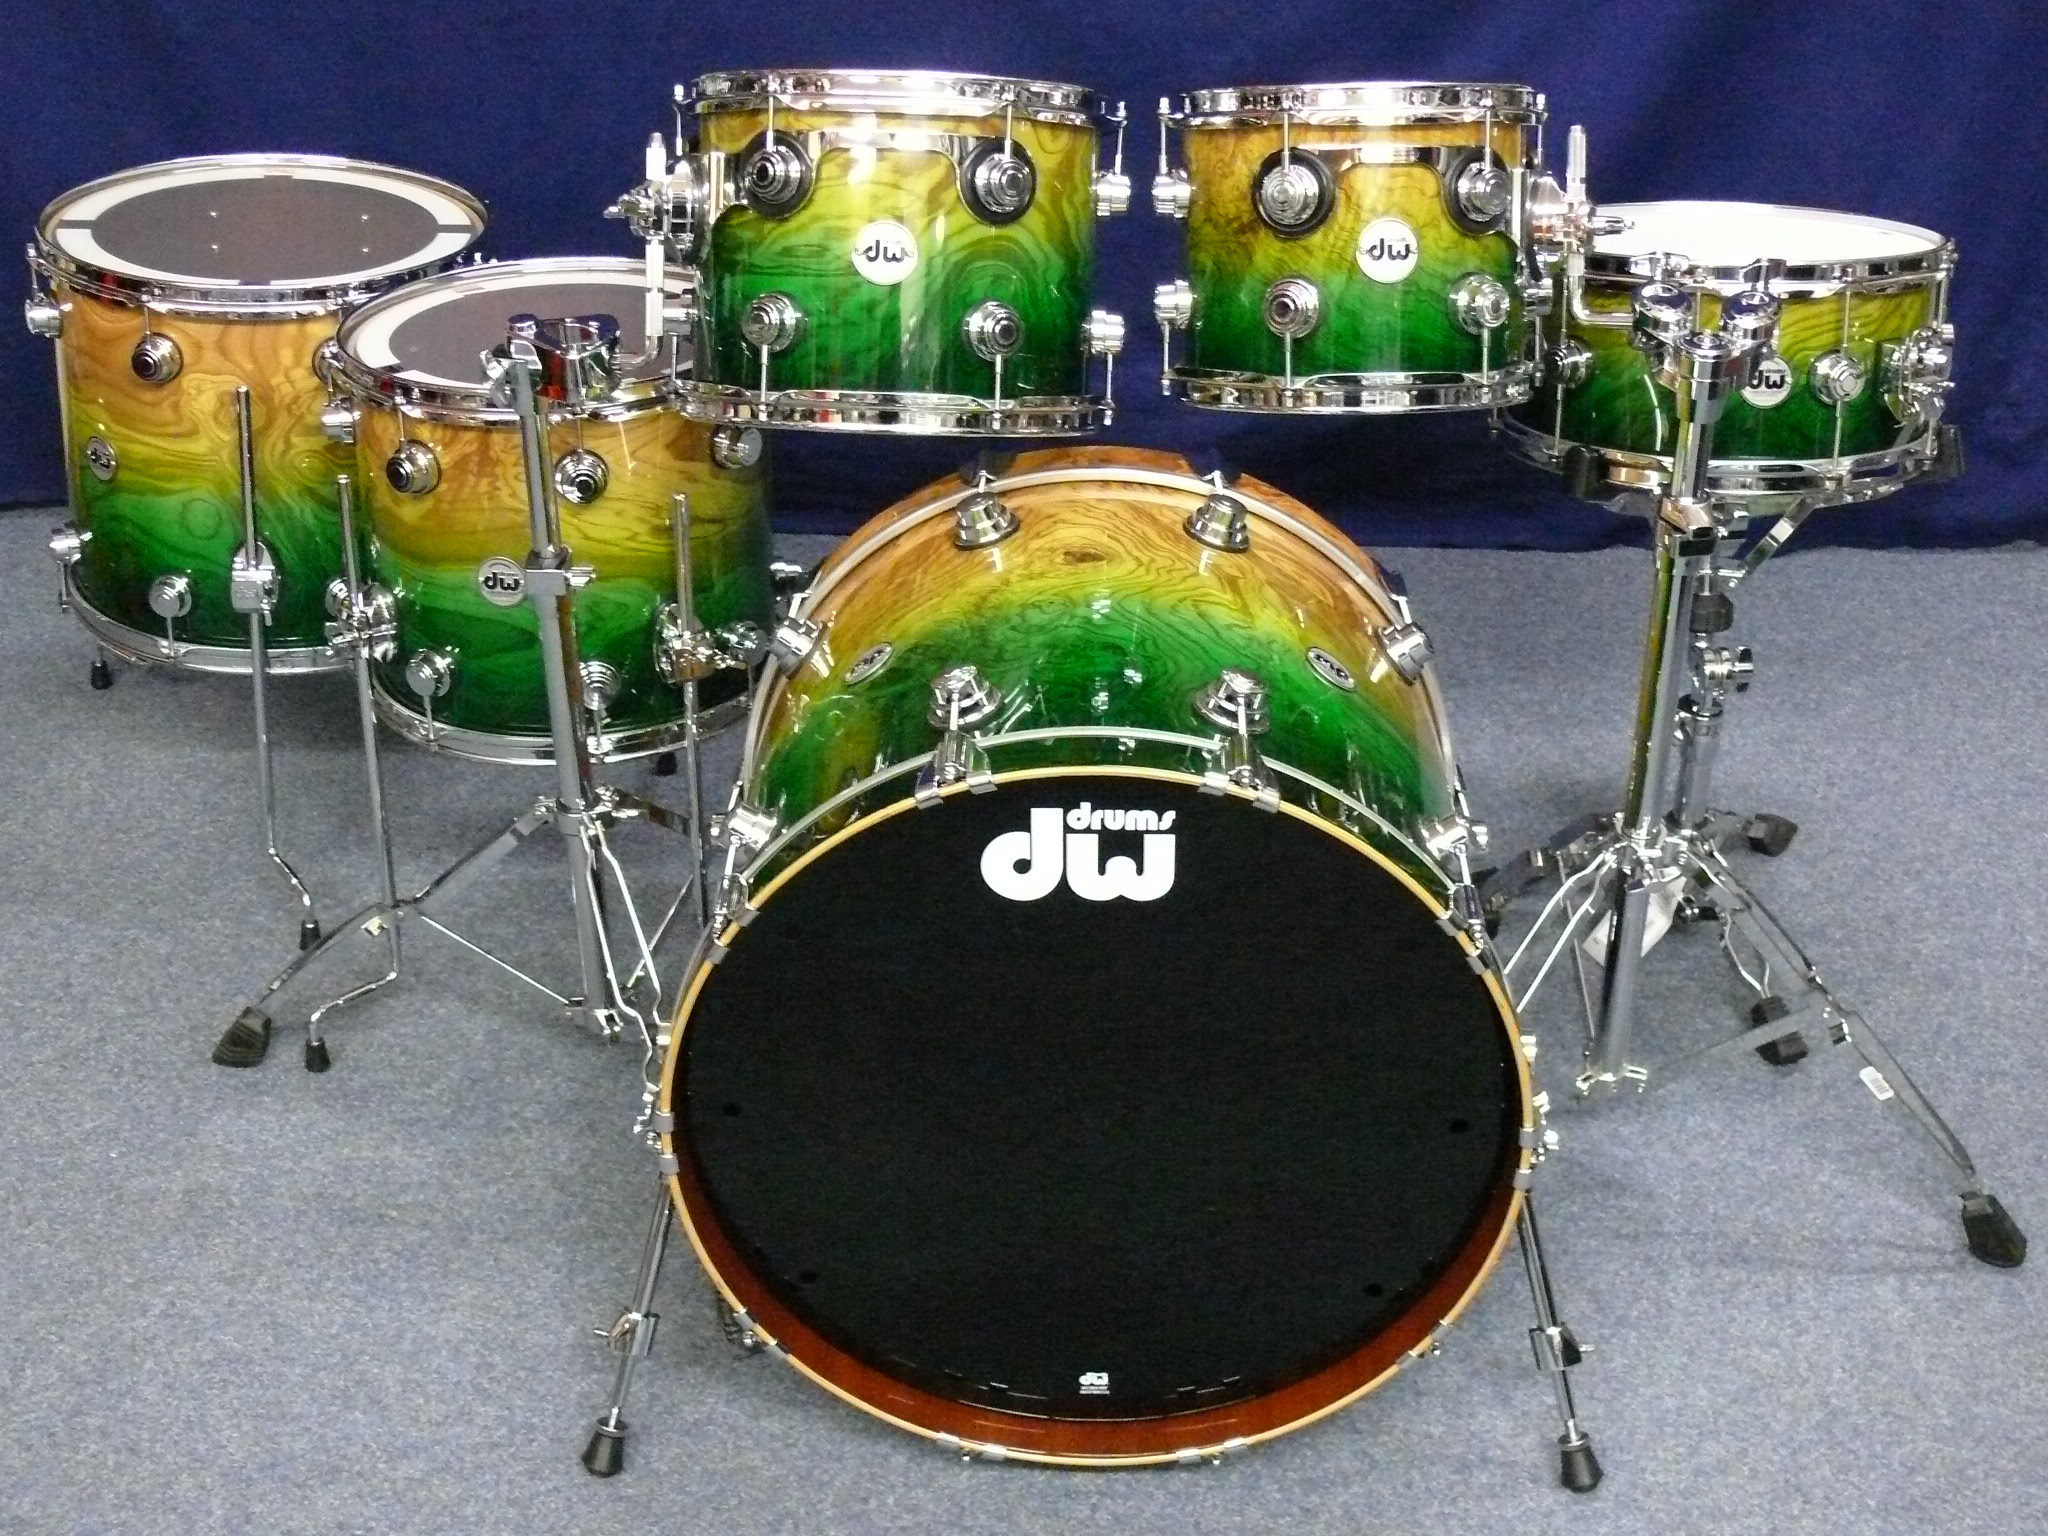 dw Drums Wallpaper dw Drums Wallpaper dw Drums